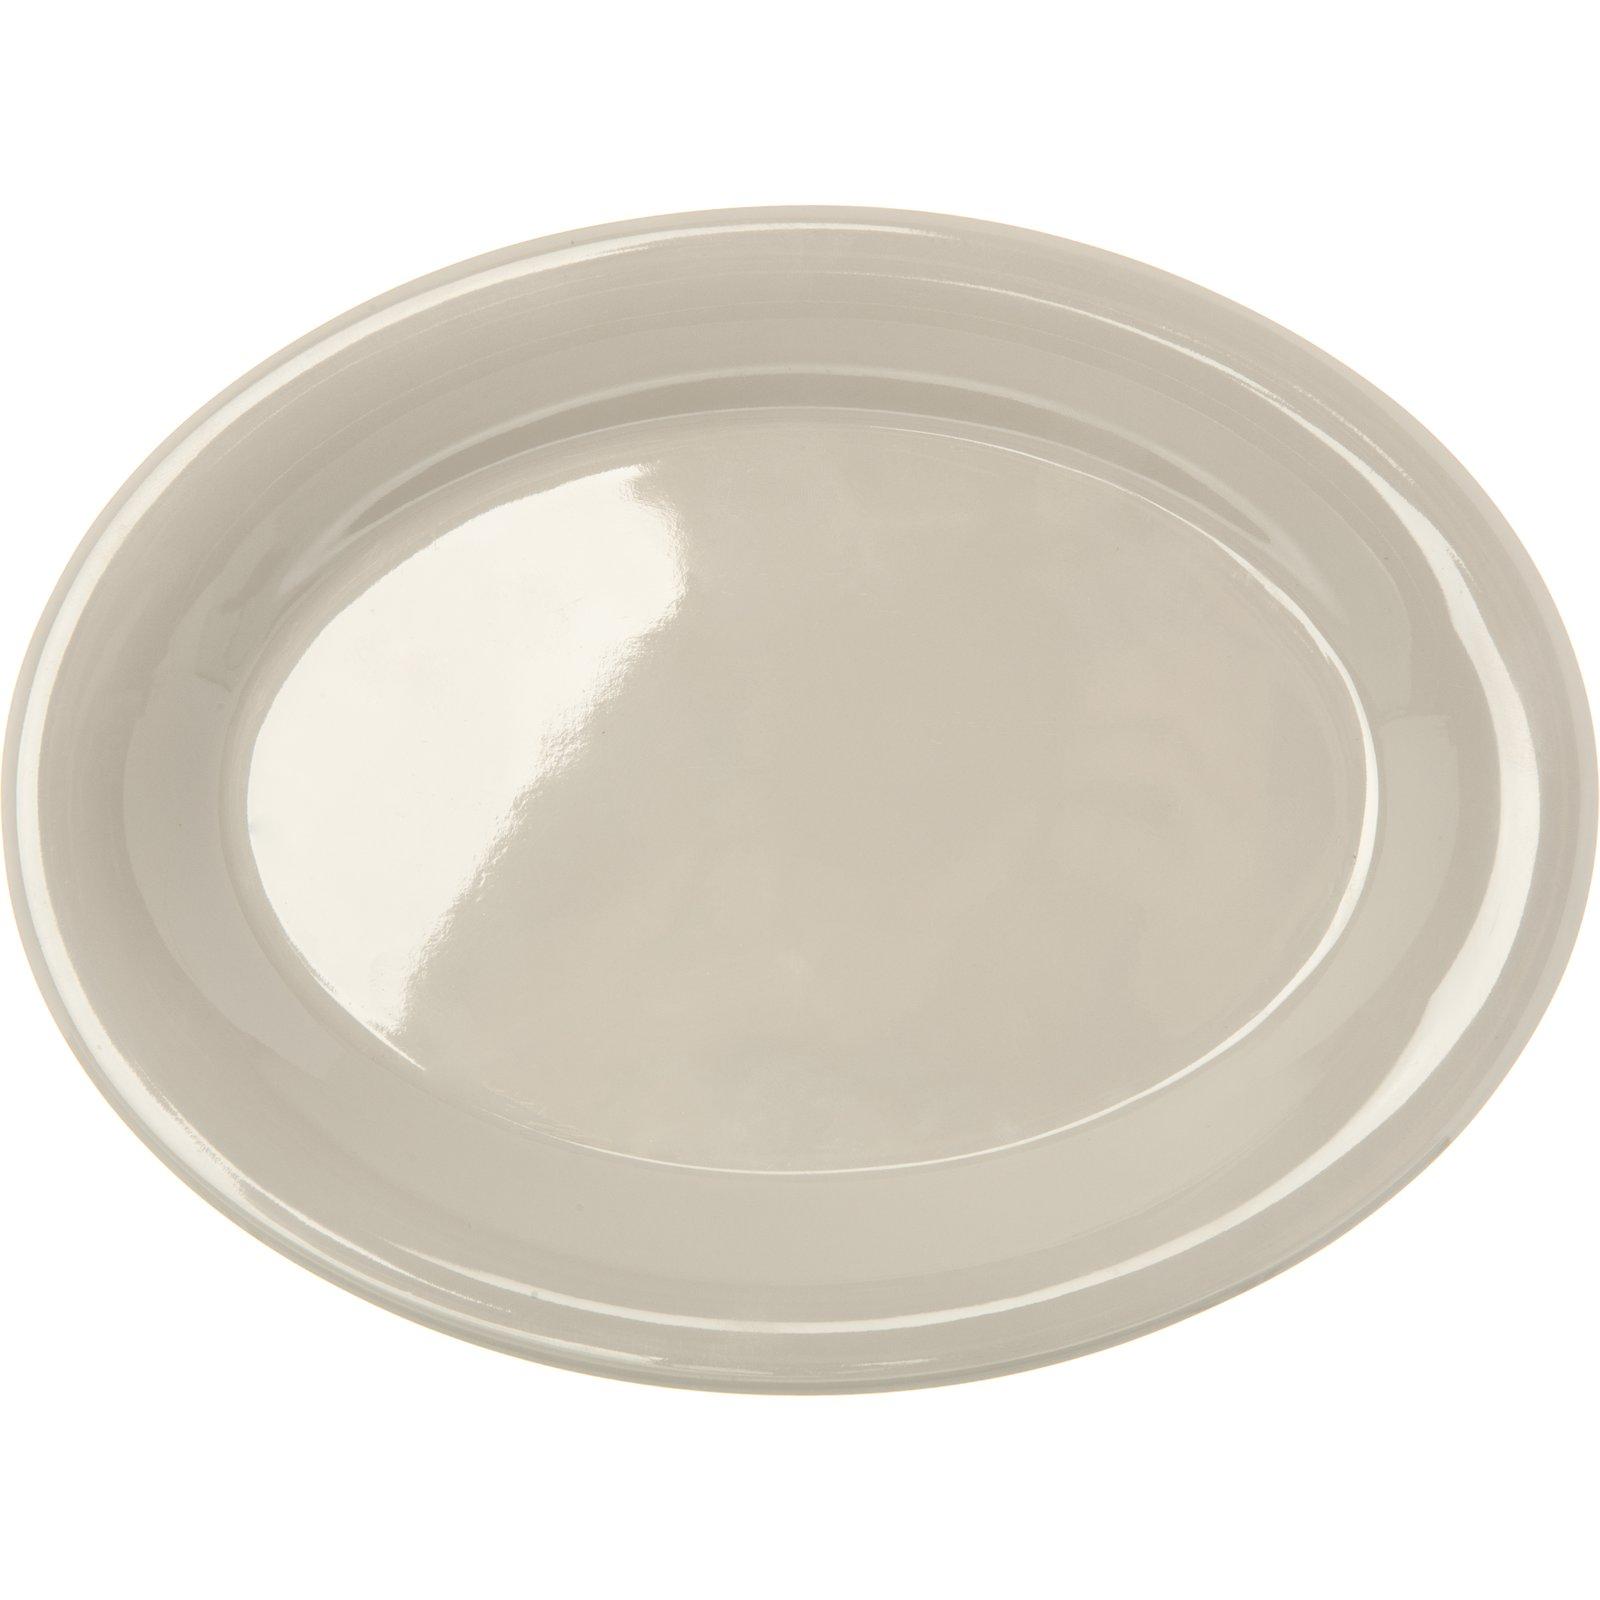 ... 4308642 - Durus® Melamine Oval Platter Tray 9.5  x 7.25  - Bone  sc 1 st  Carlisle FoodService Products & 4308642 - Durus® Melamine Oval Platter Tray 9.5